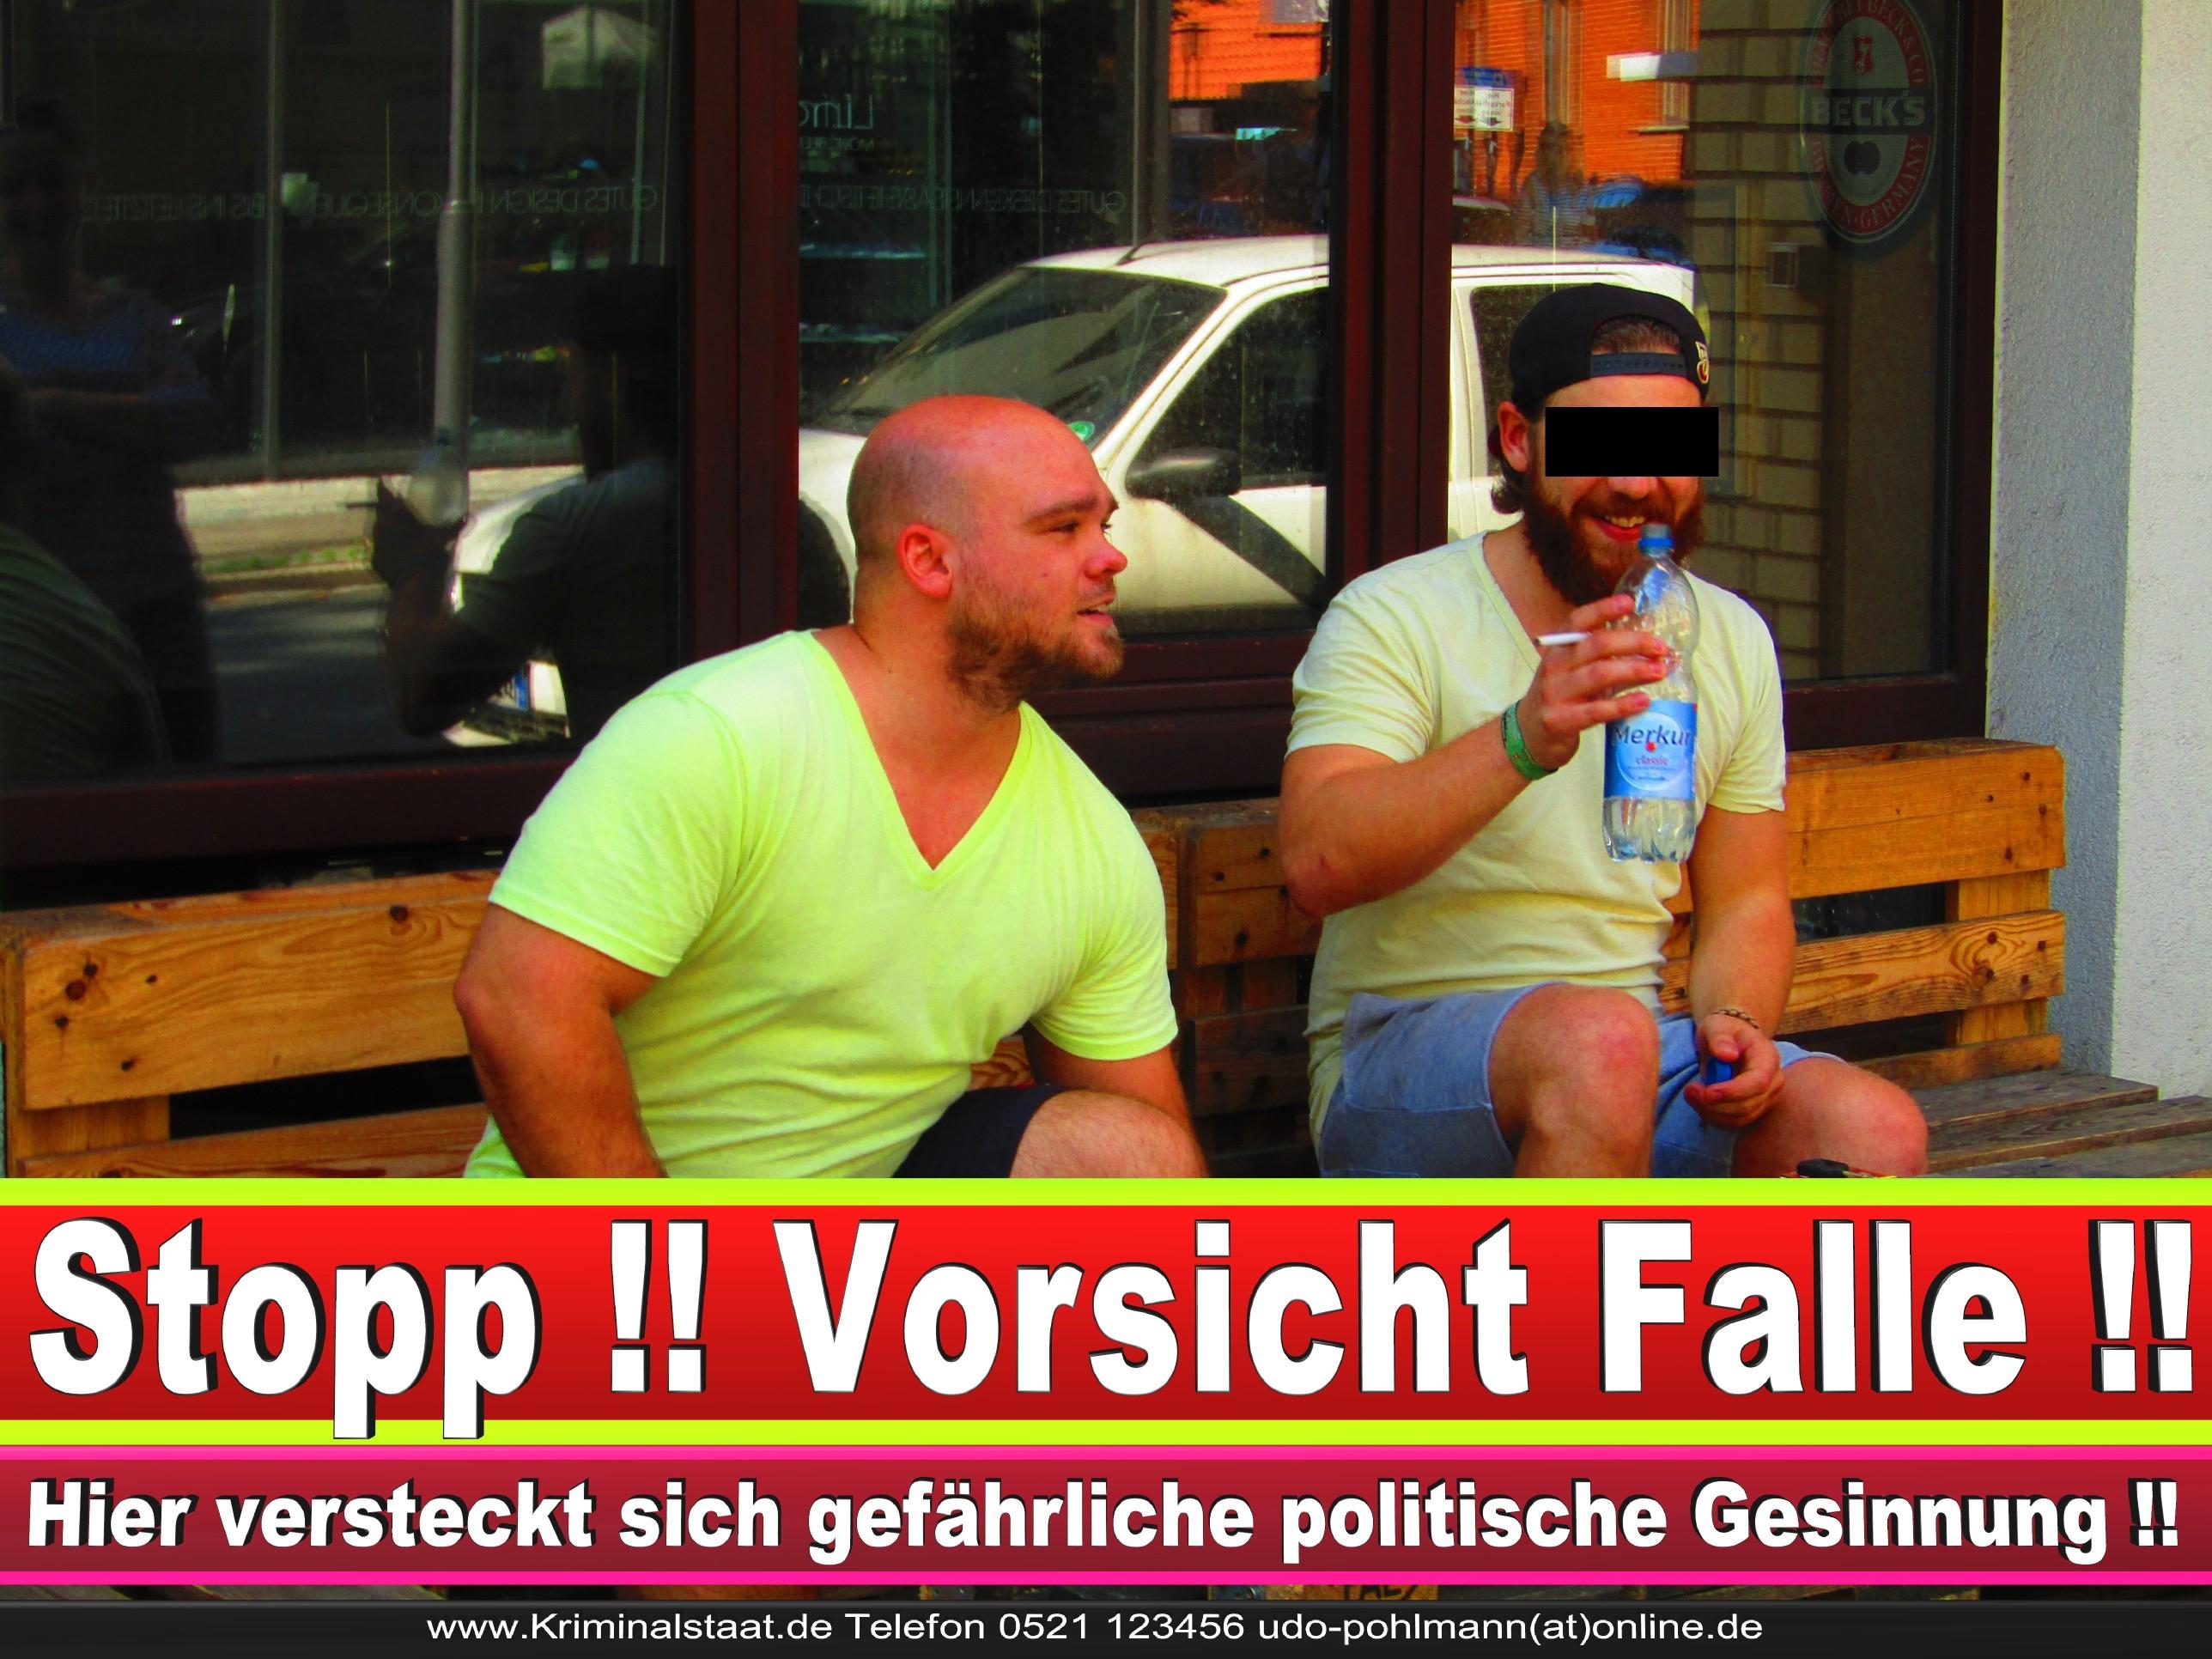 ROCK CAFE BIELEFELD CDU BIELEFELD Inhaber Niklas Meyer Und Markus Prange 3 LANDTAGSWAHL BUNDESTAGSWAHL BÜRGERMEISTERWAHL